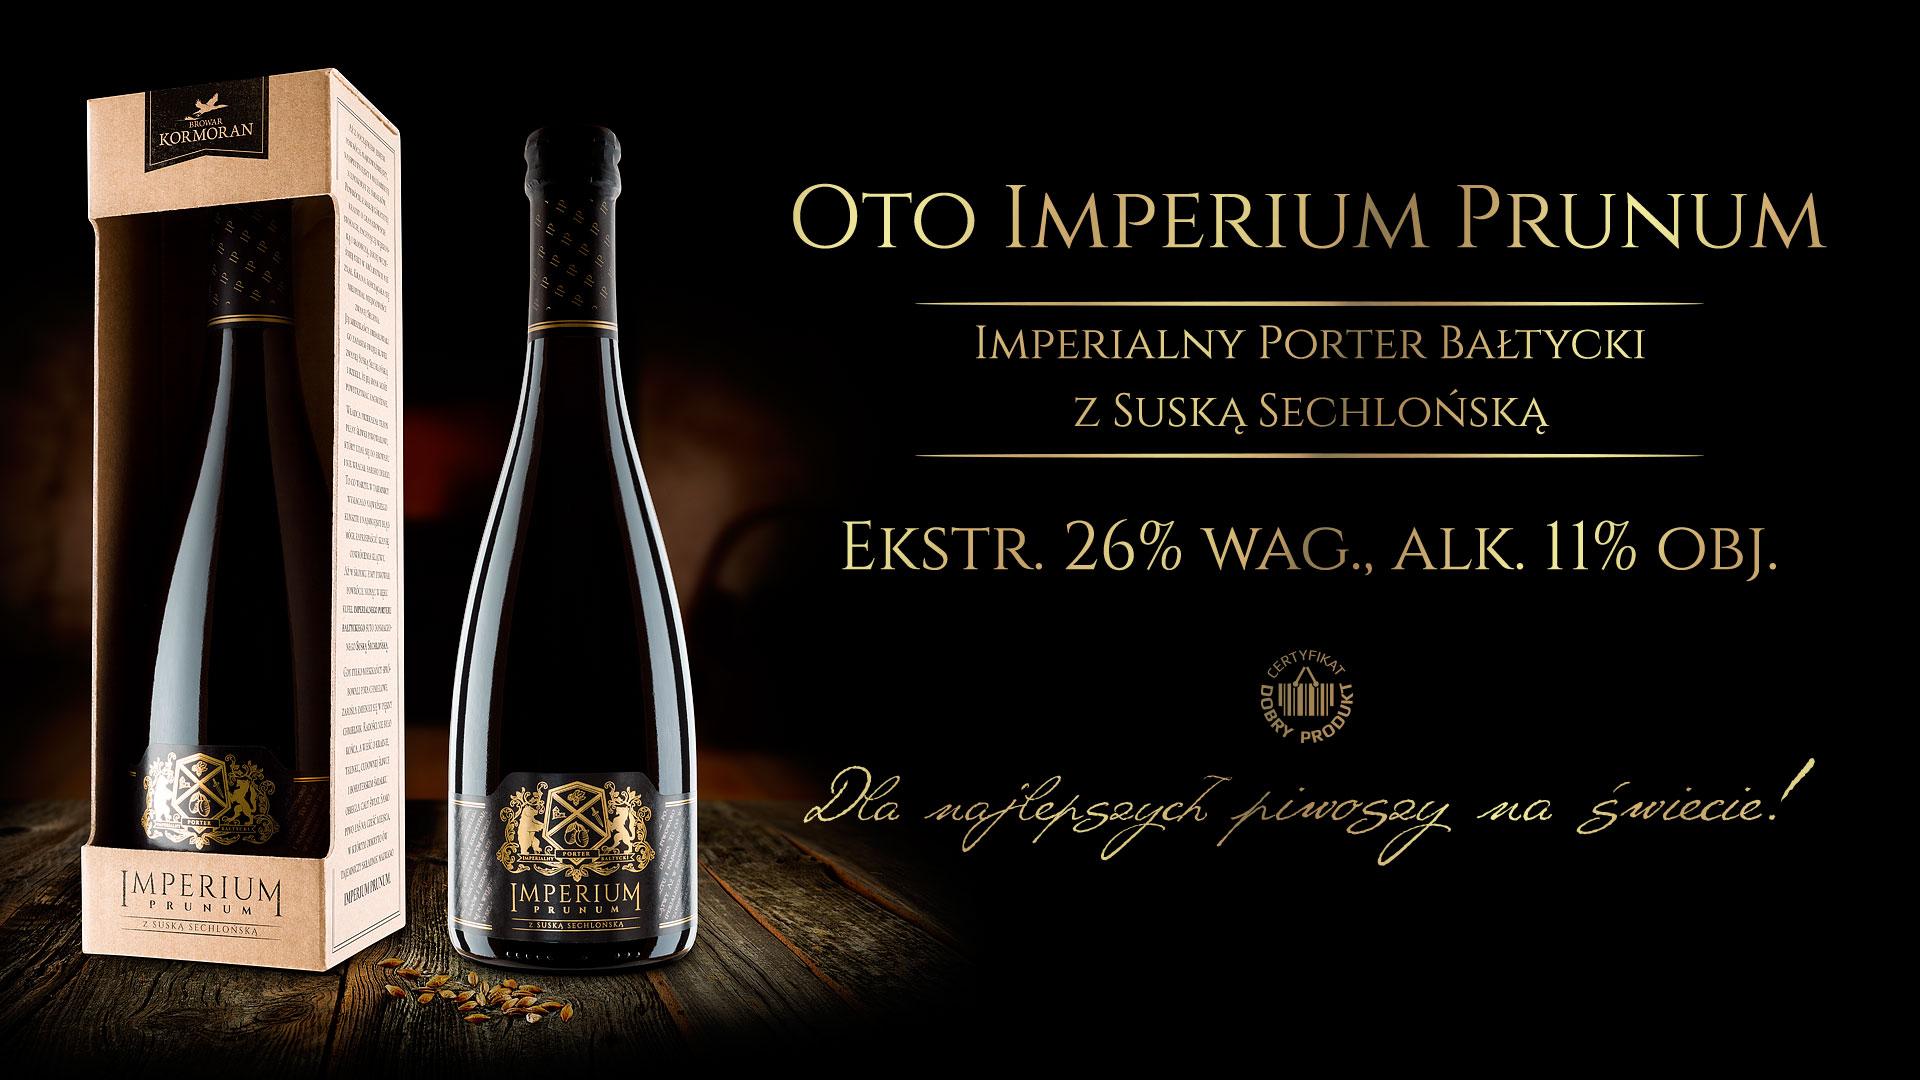 Piwo Imperium Prunum 2018 - Browar Kormoran